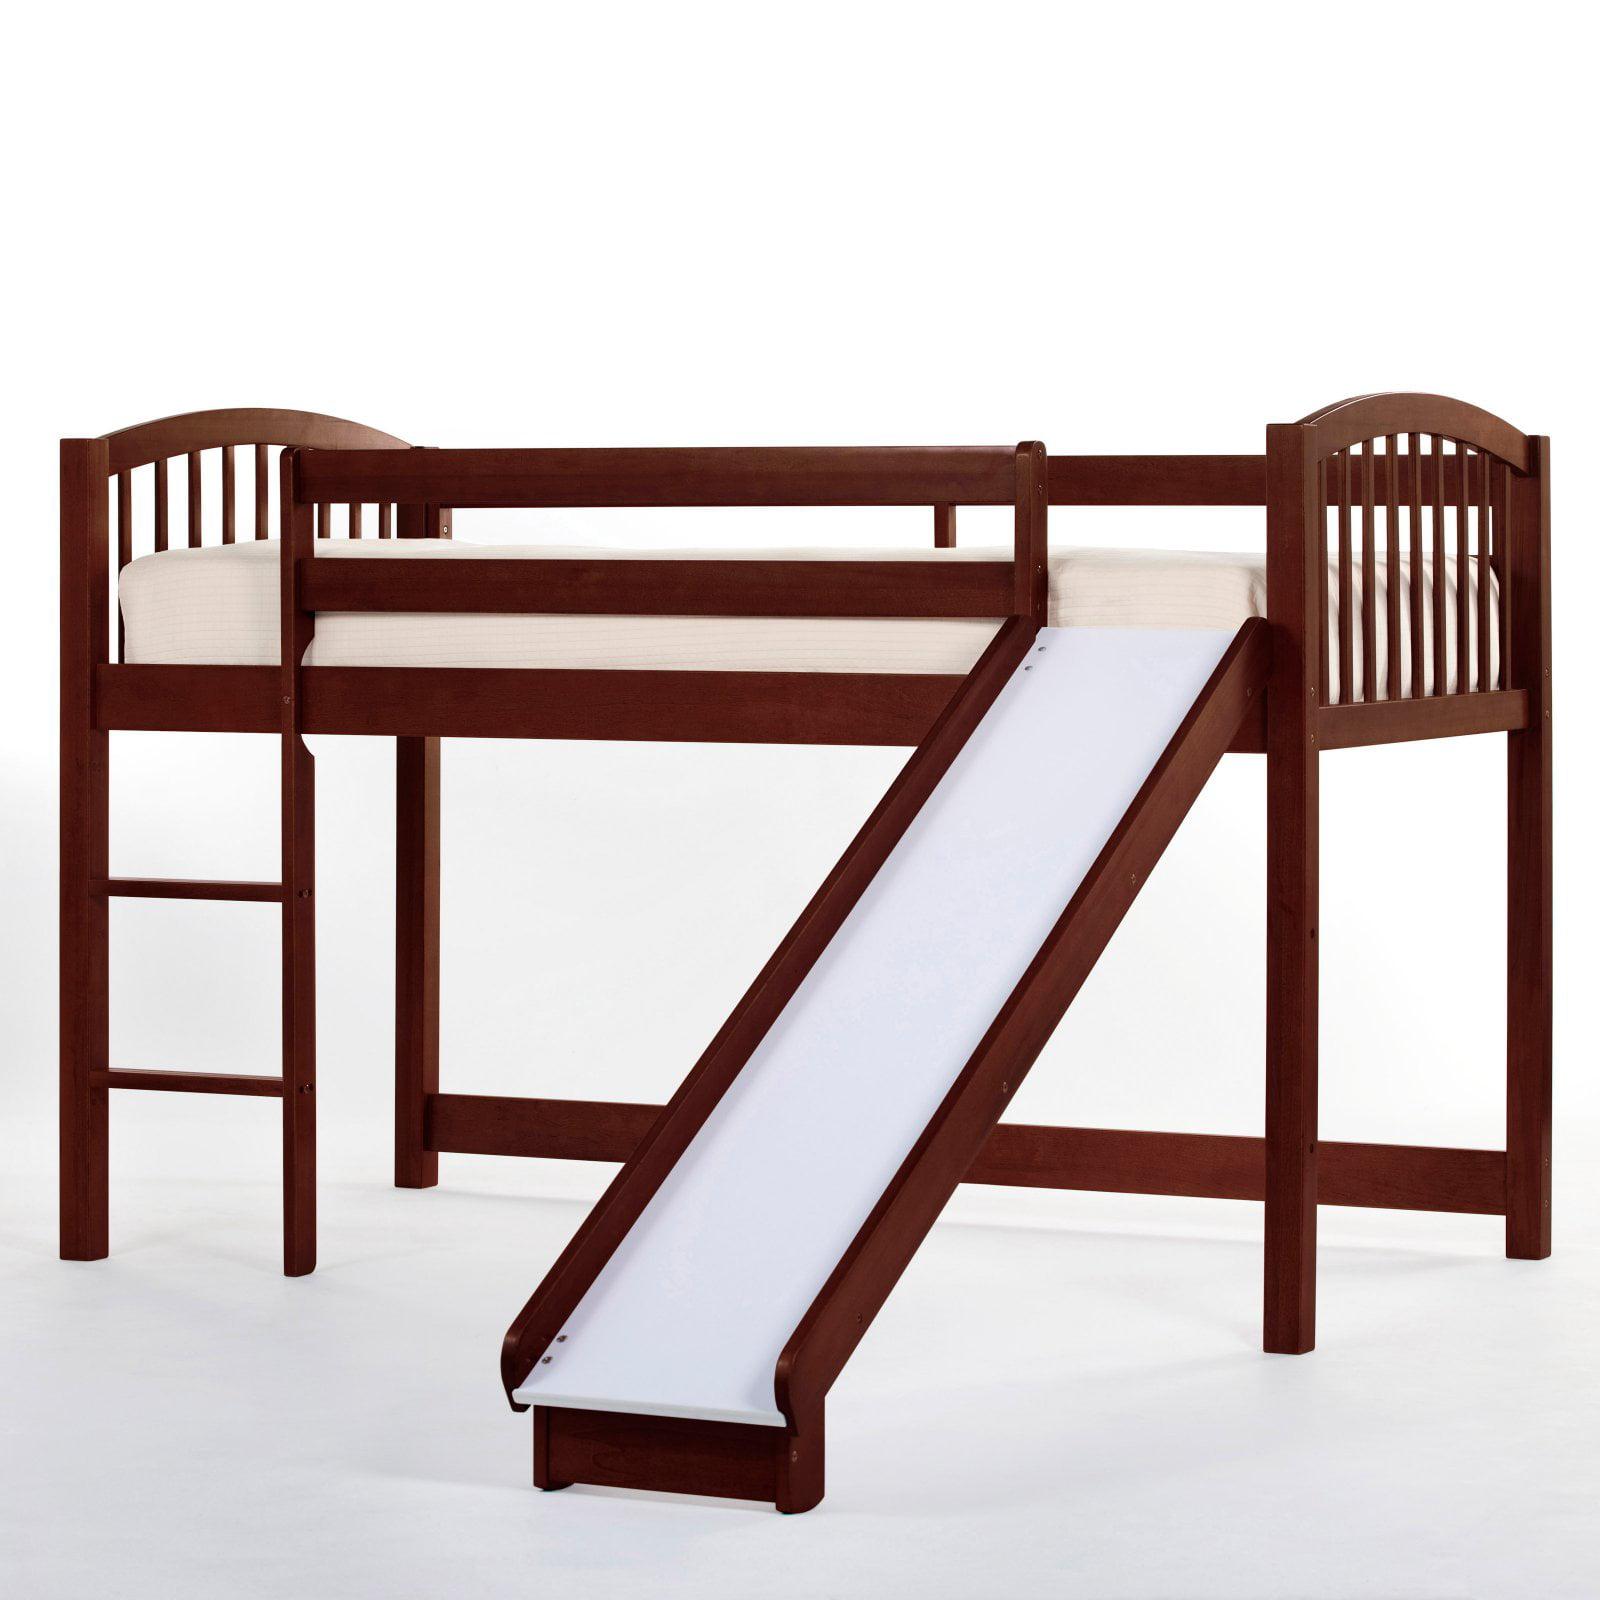 NE Kids Schoolhouse Junior Loft Bed with Slide - Cherry